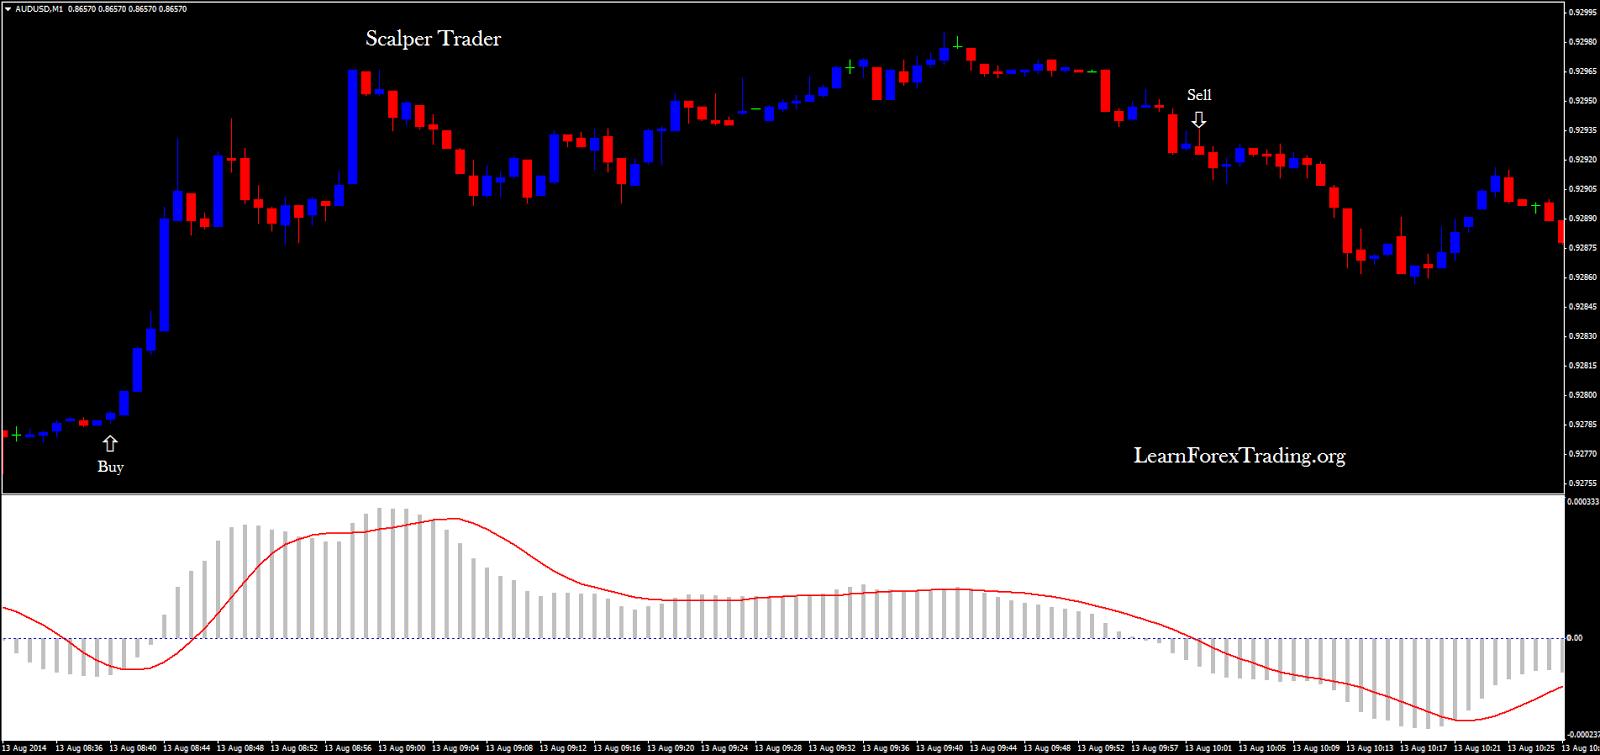 Scalper Trader